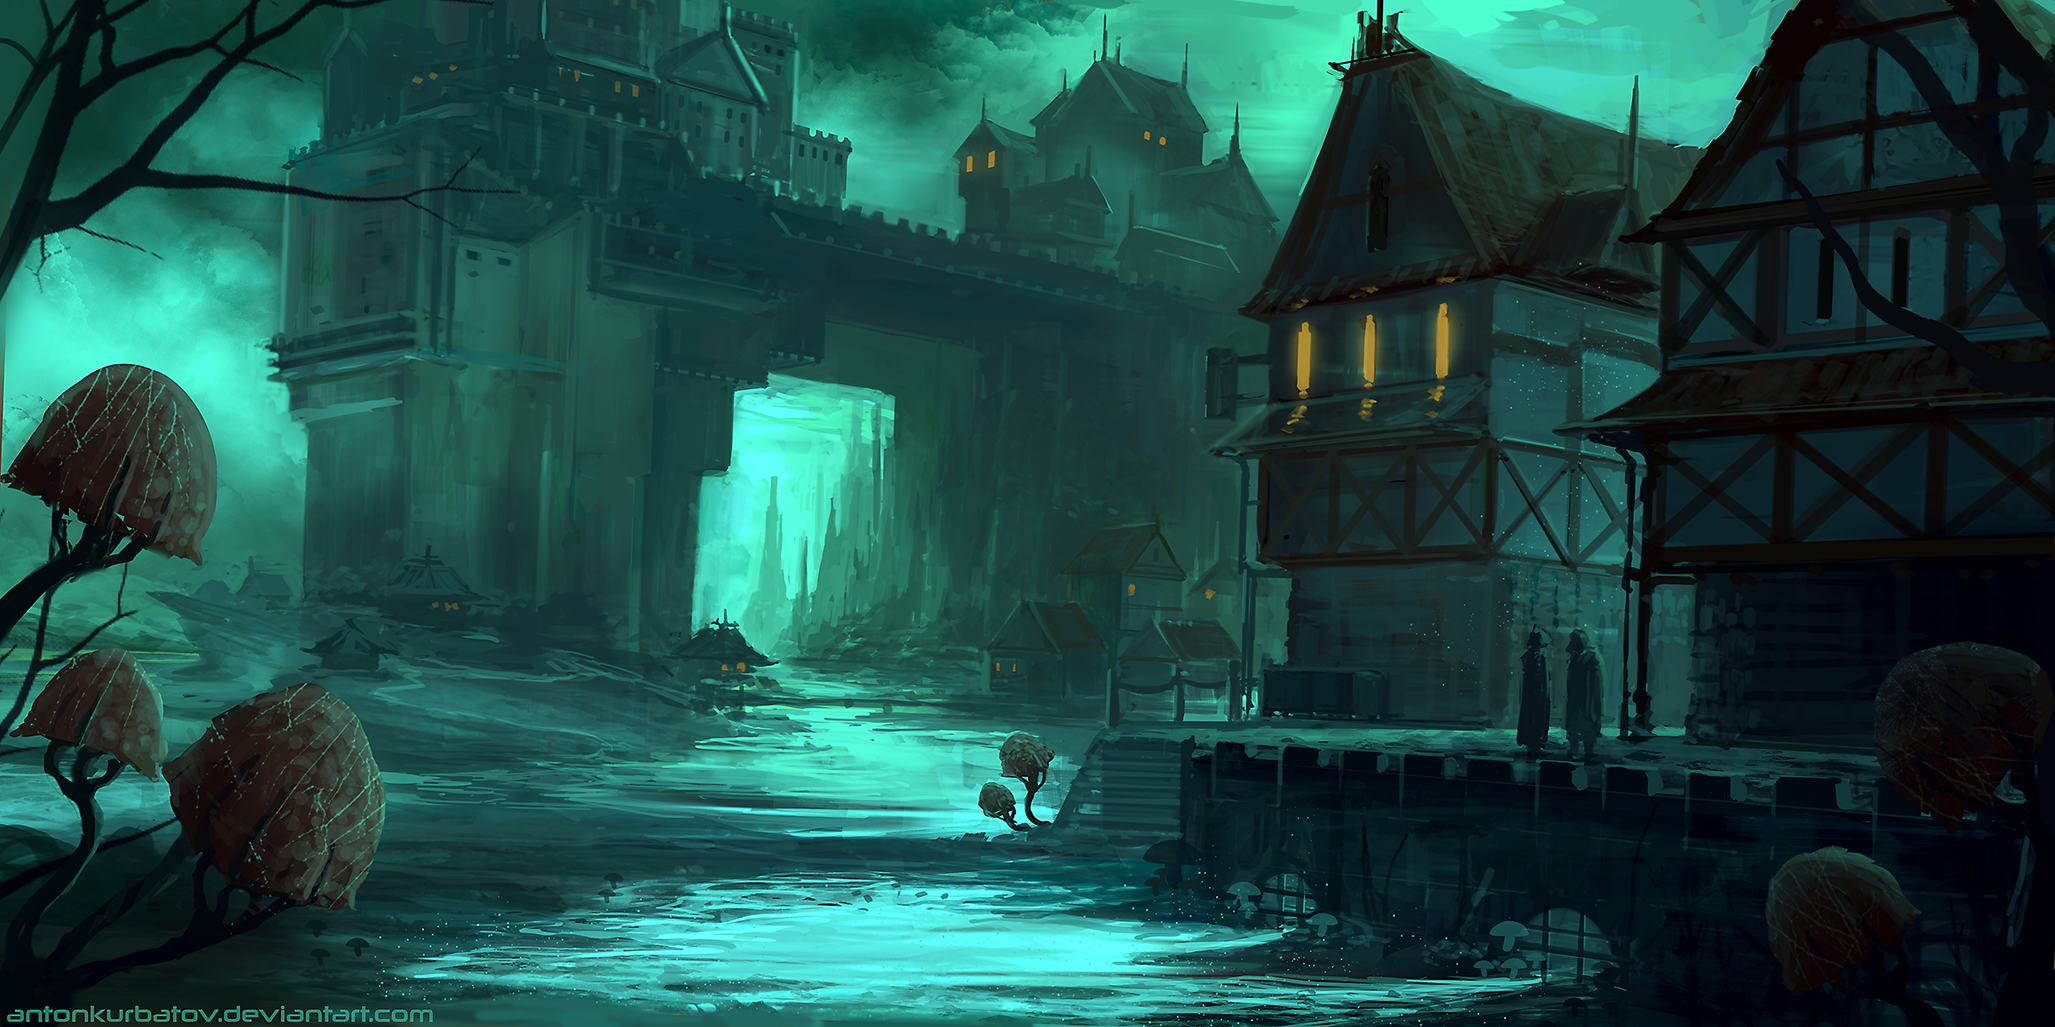 Dark Coast by AntonKurbatov